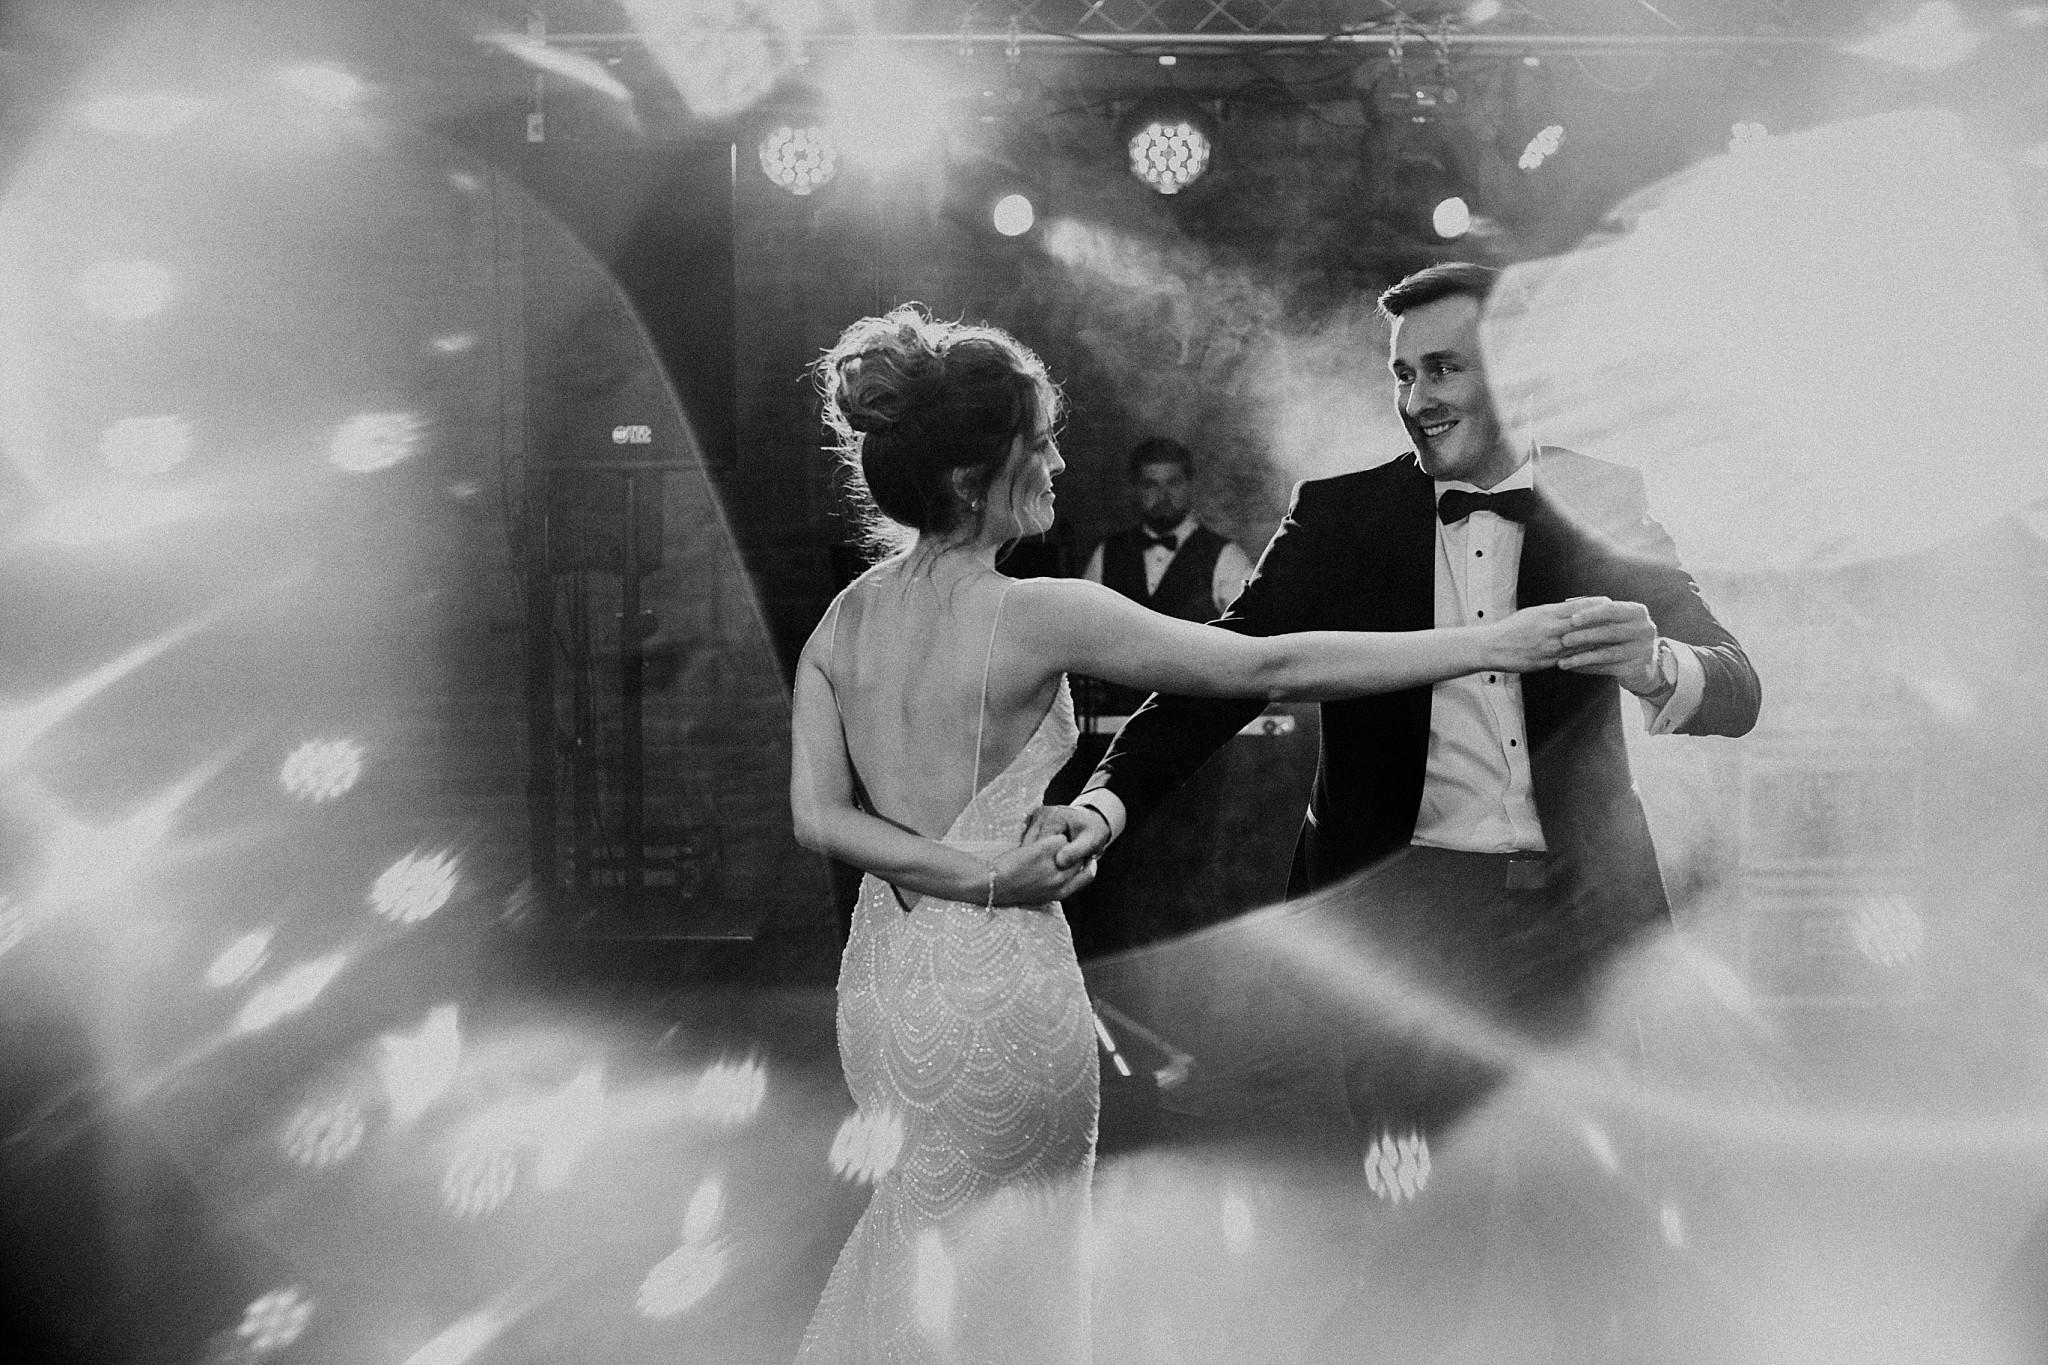 fotograf poznan wesele dobra truskawka piekne wesele pod poznaniem wesele w dobrej truskawce piekna para mloda slub marzen slub koronawirus slub listopad wesele koronawirus 320